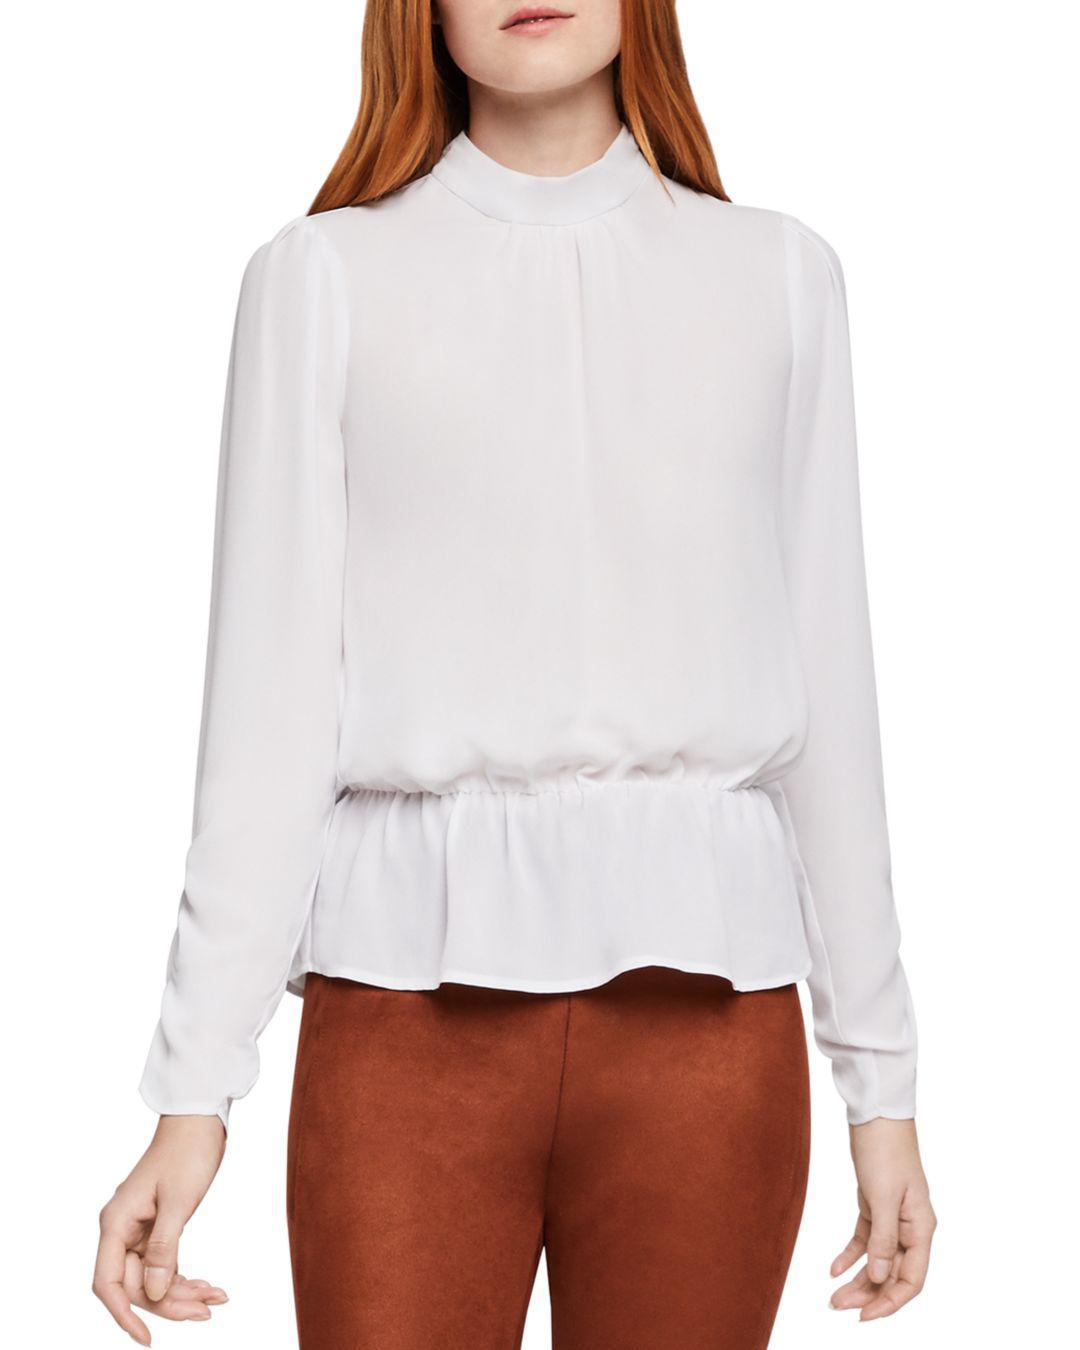 56a18e8345299 Lyst - Bcbgeneration Georgette Peplum Top in White